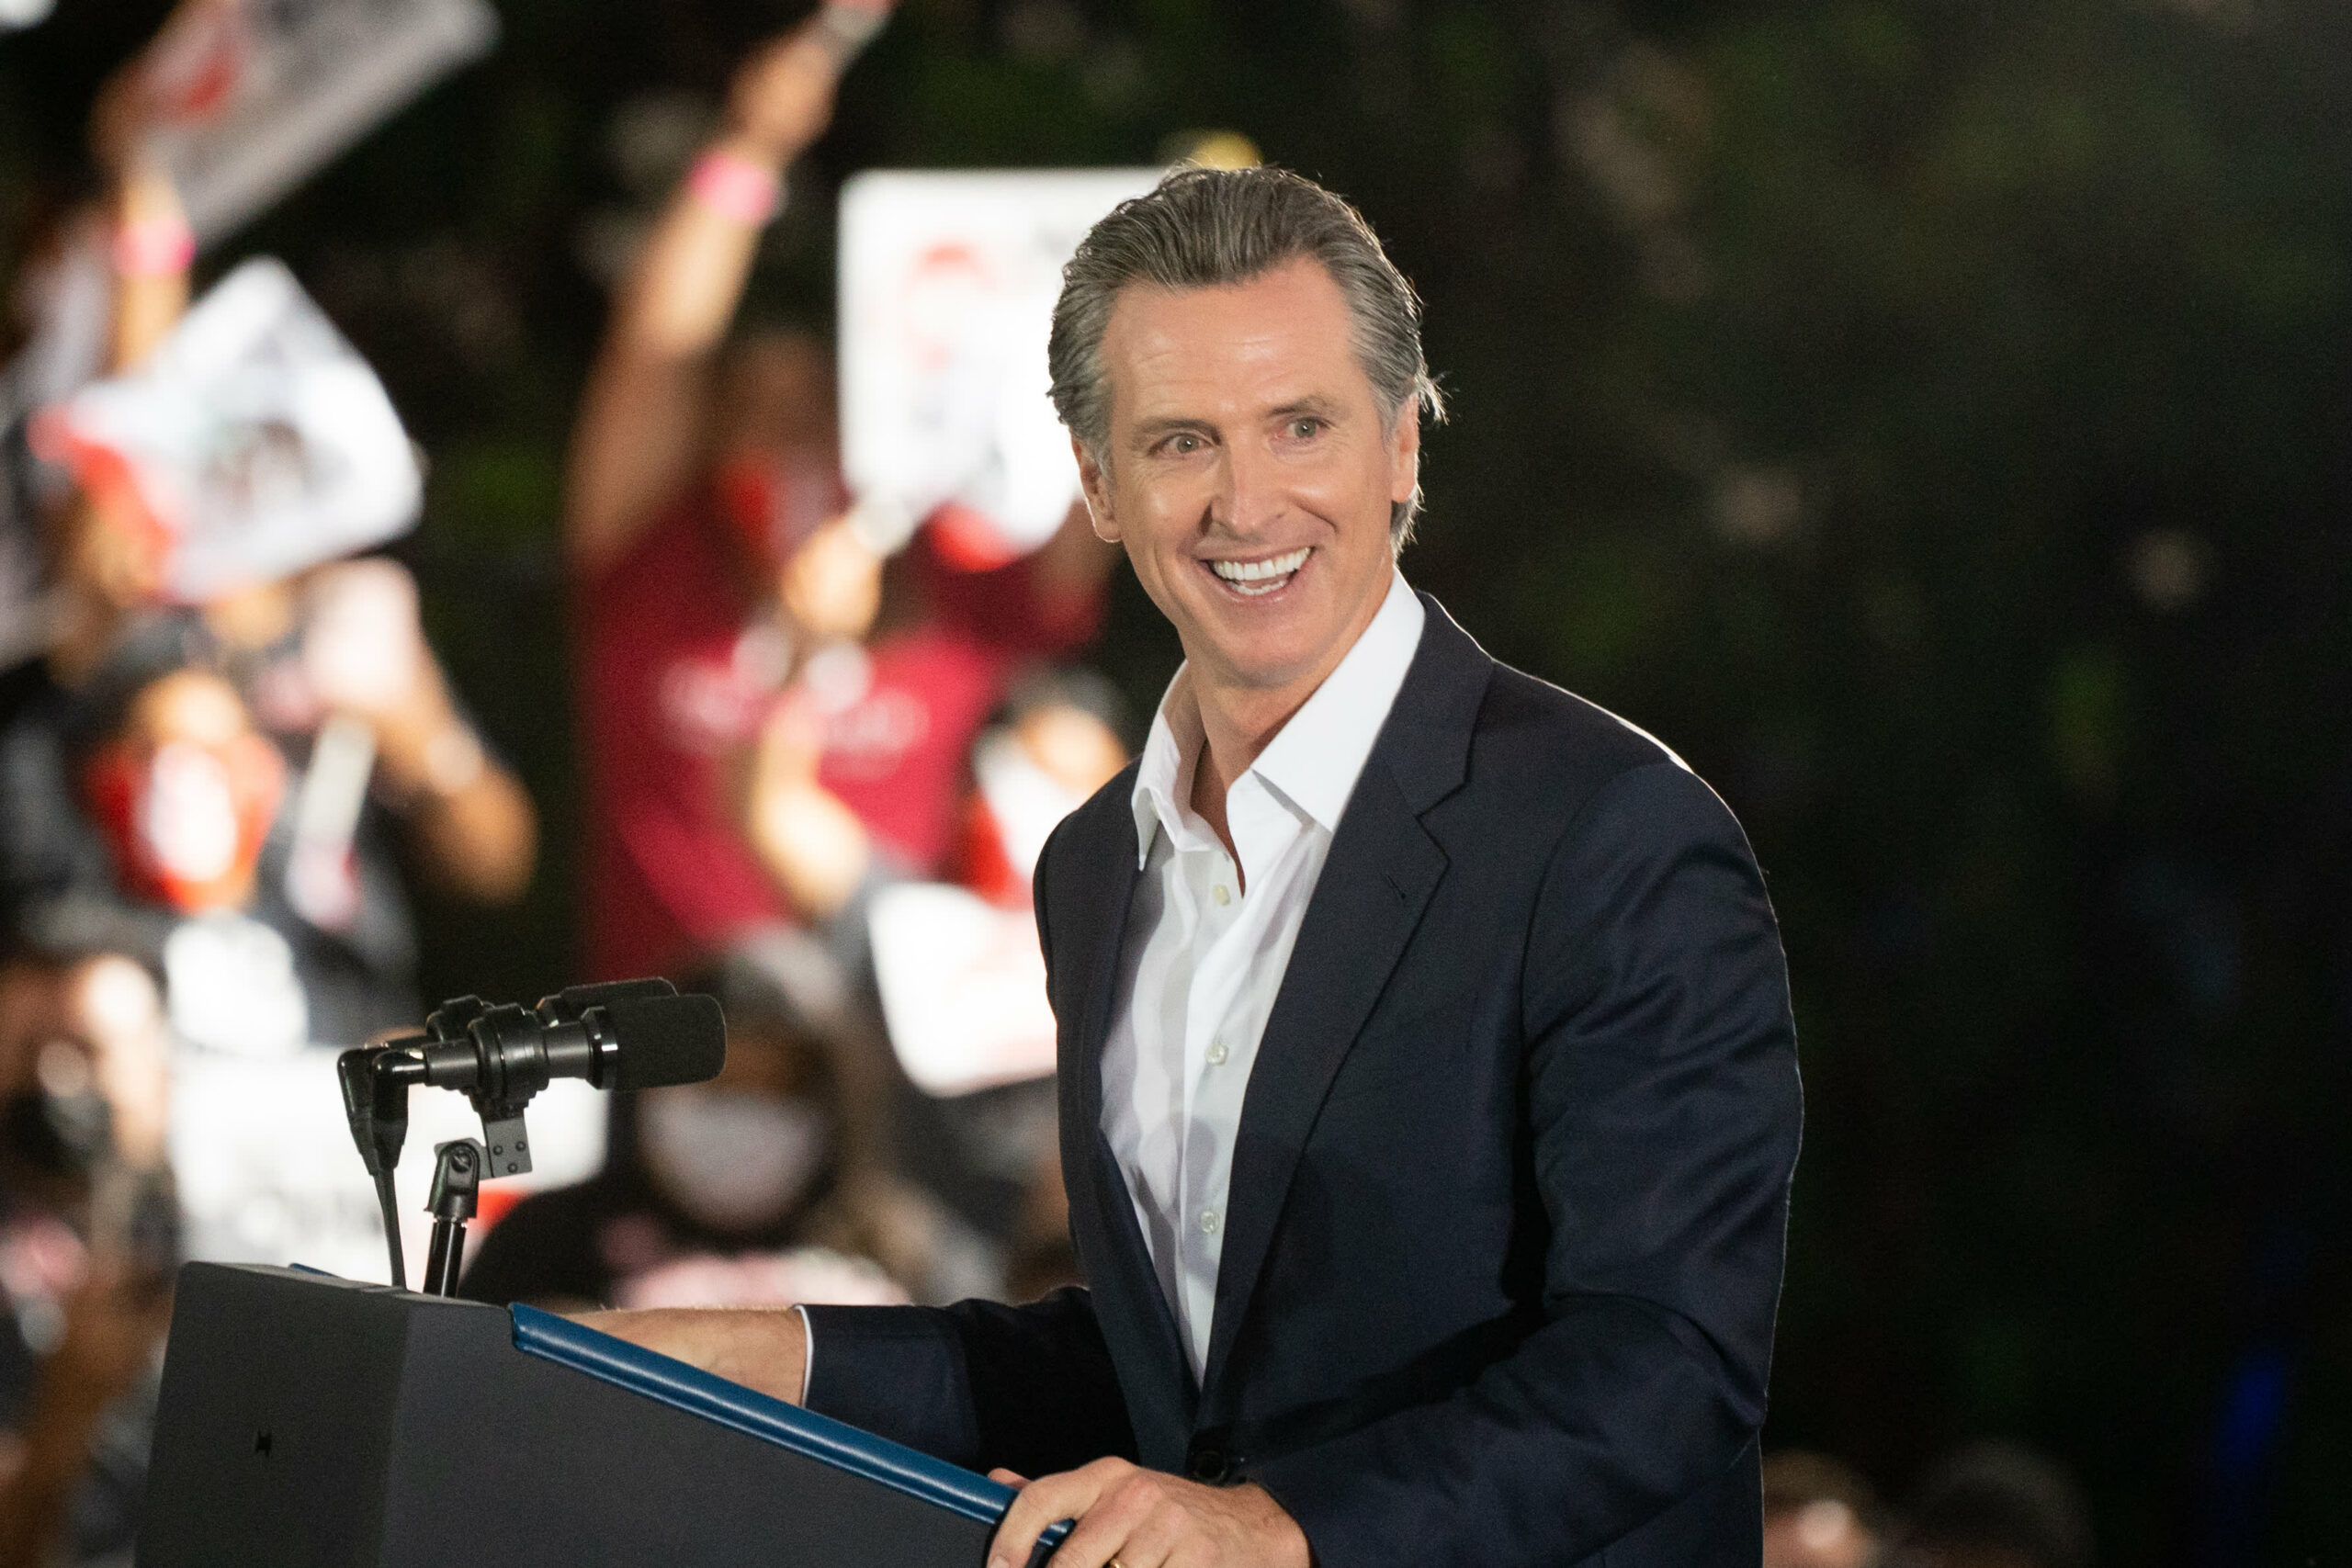 Democrat Gavin Newsom wins California recall election, NBC News projects